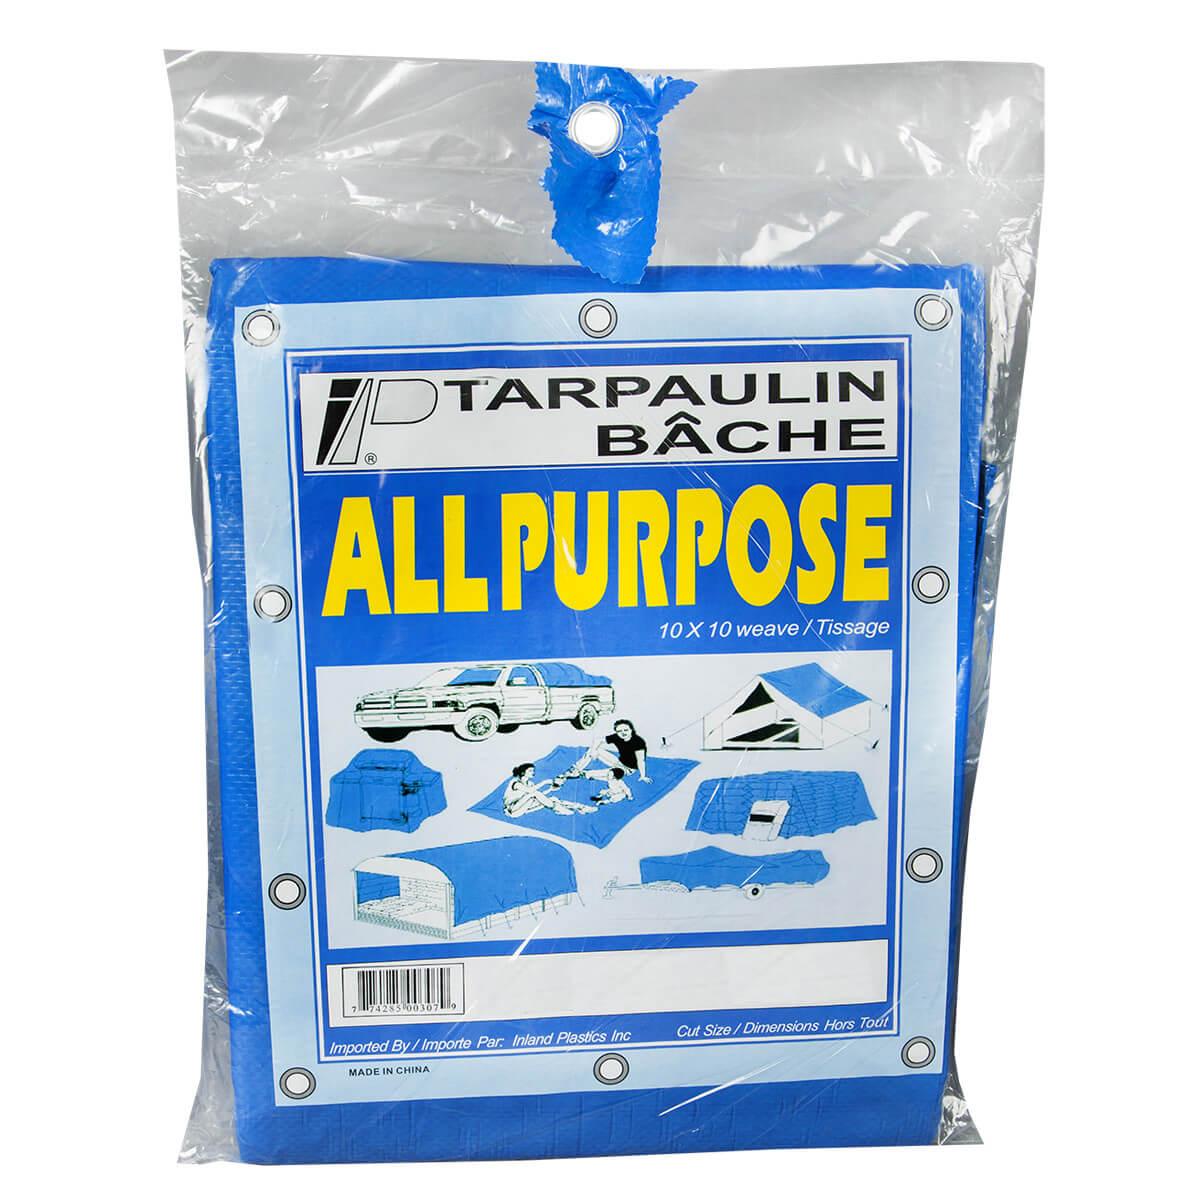 All Purpose Blue Utility Tarps - 30' x 50'